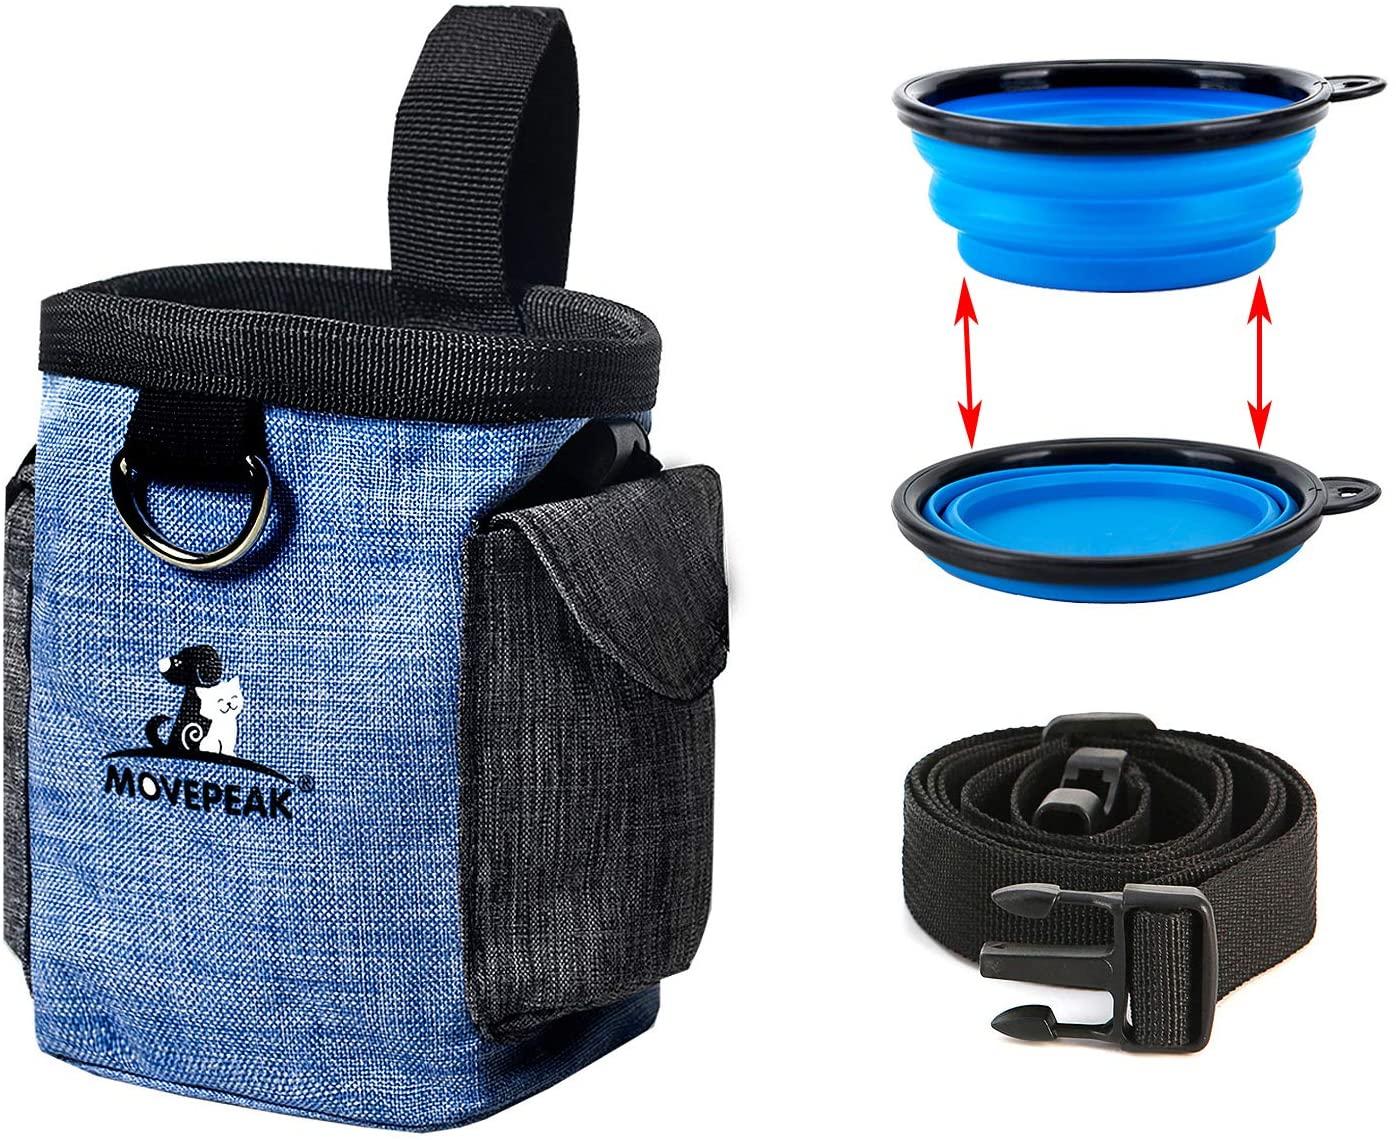 ZffXH Dog Treat Pouch Bag with Collapsible Bowl, Waist Shoulder Strap andPoop Bag Dispenser